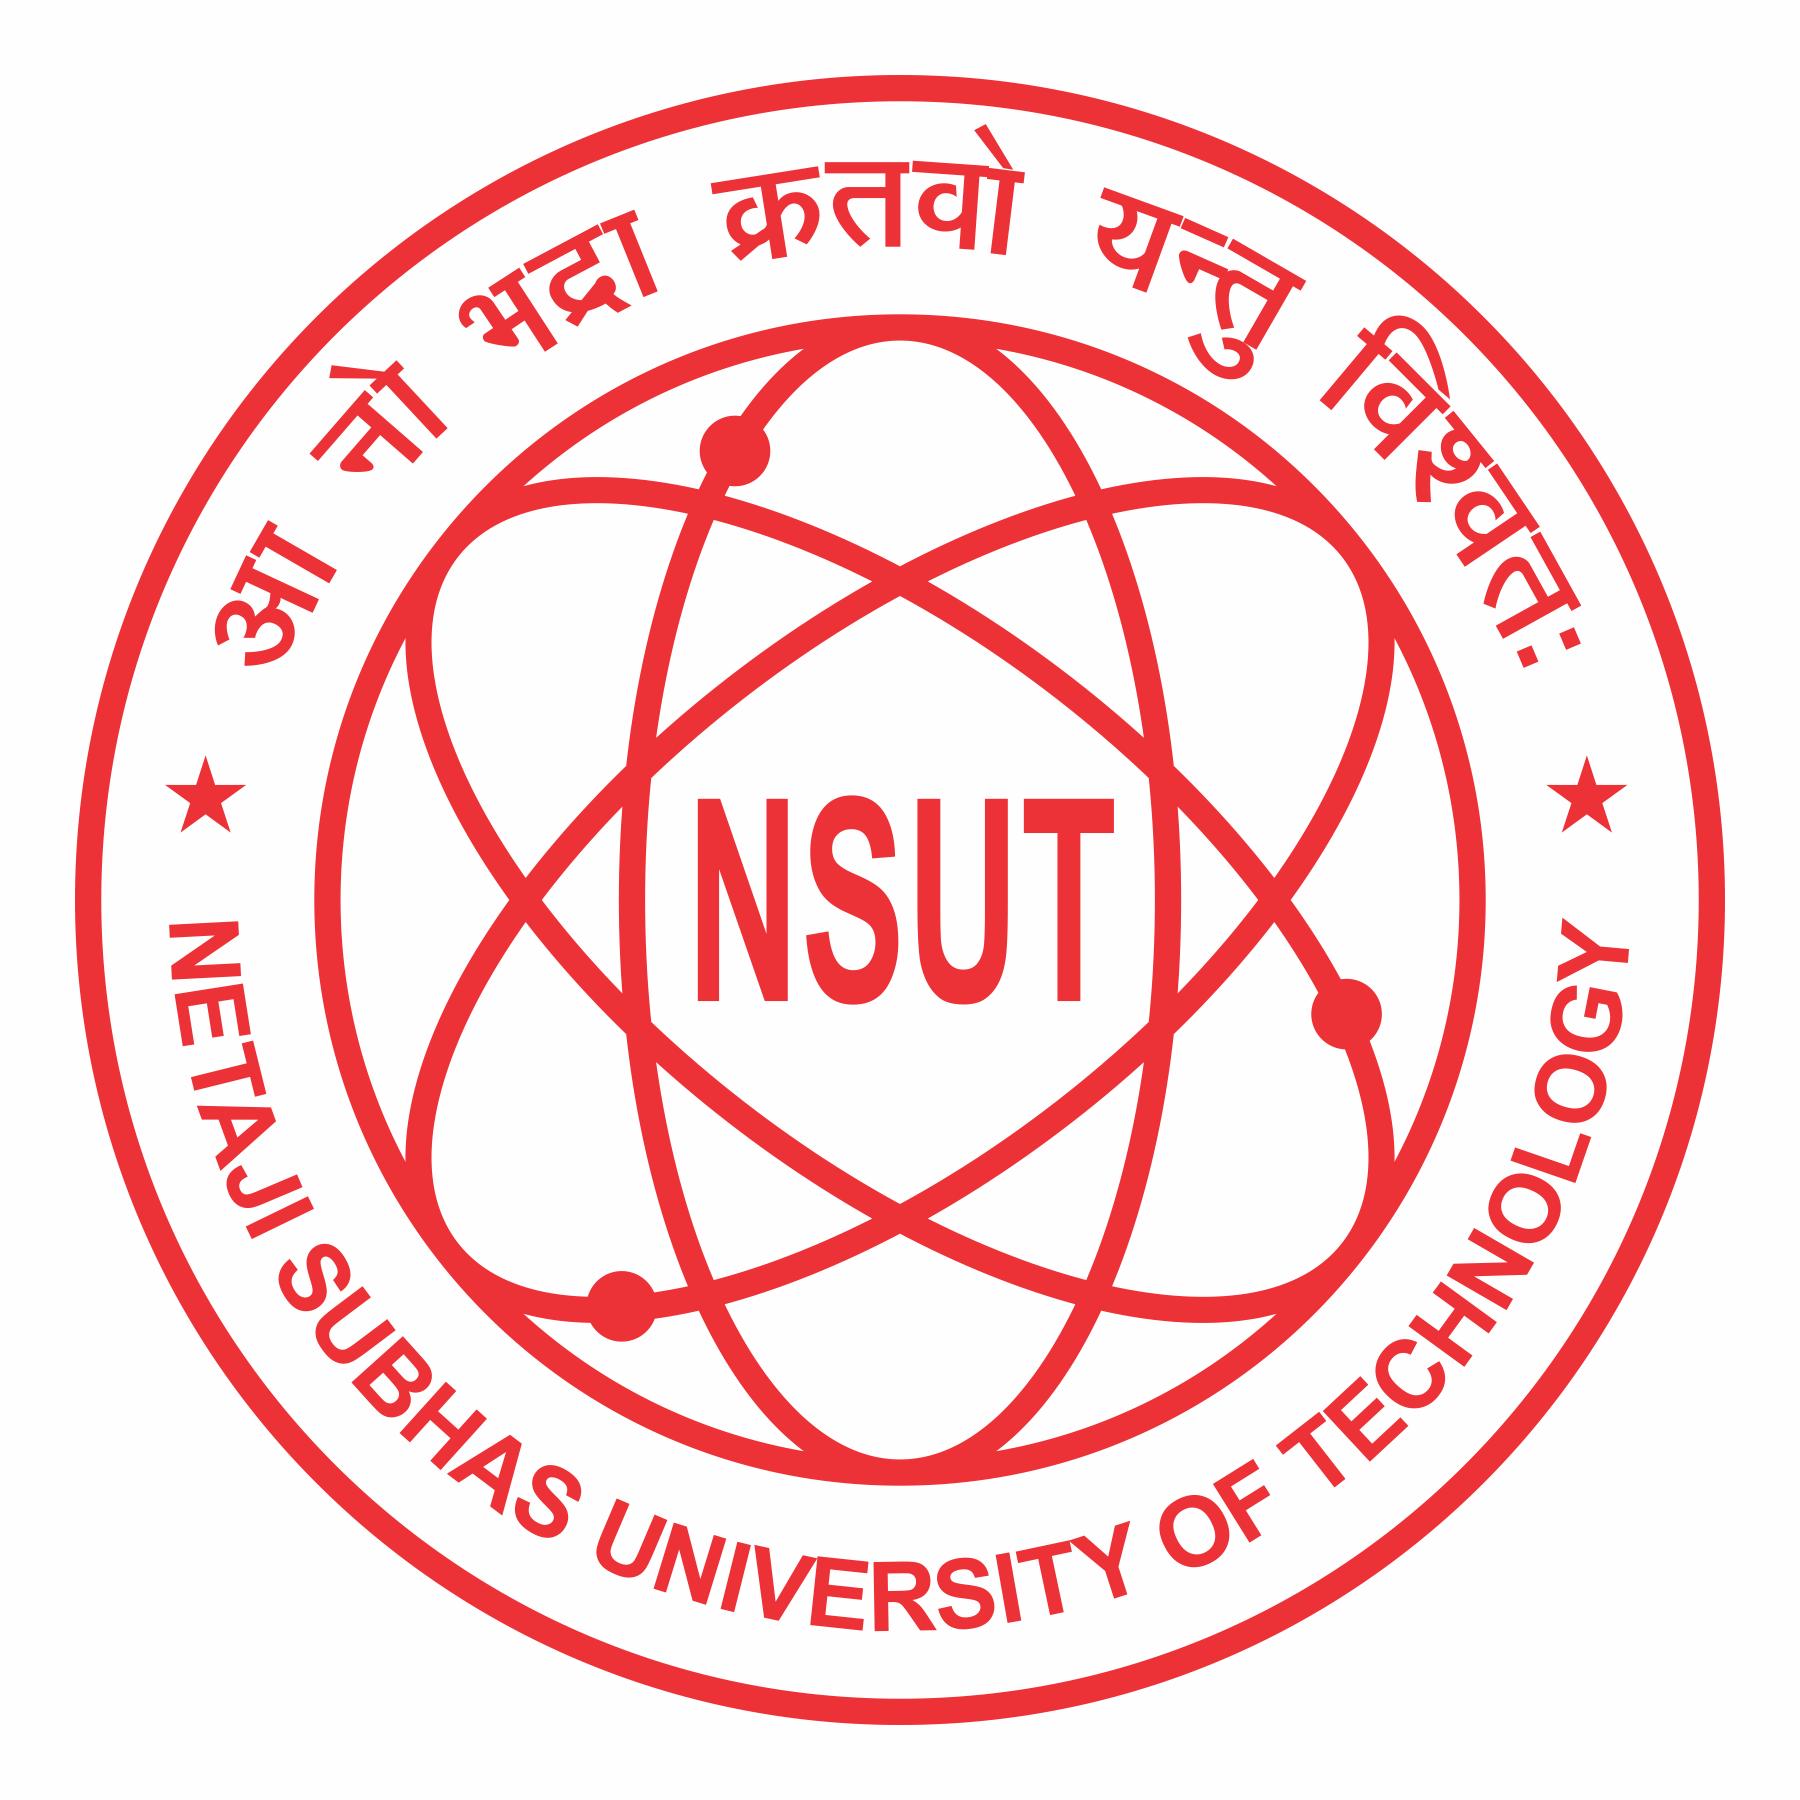 Netaji Subhas University of Technology